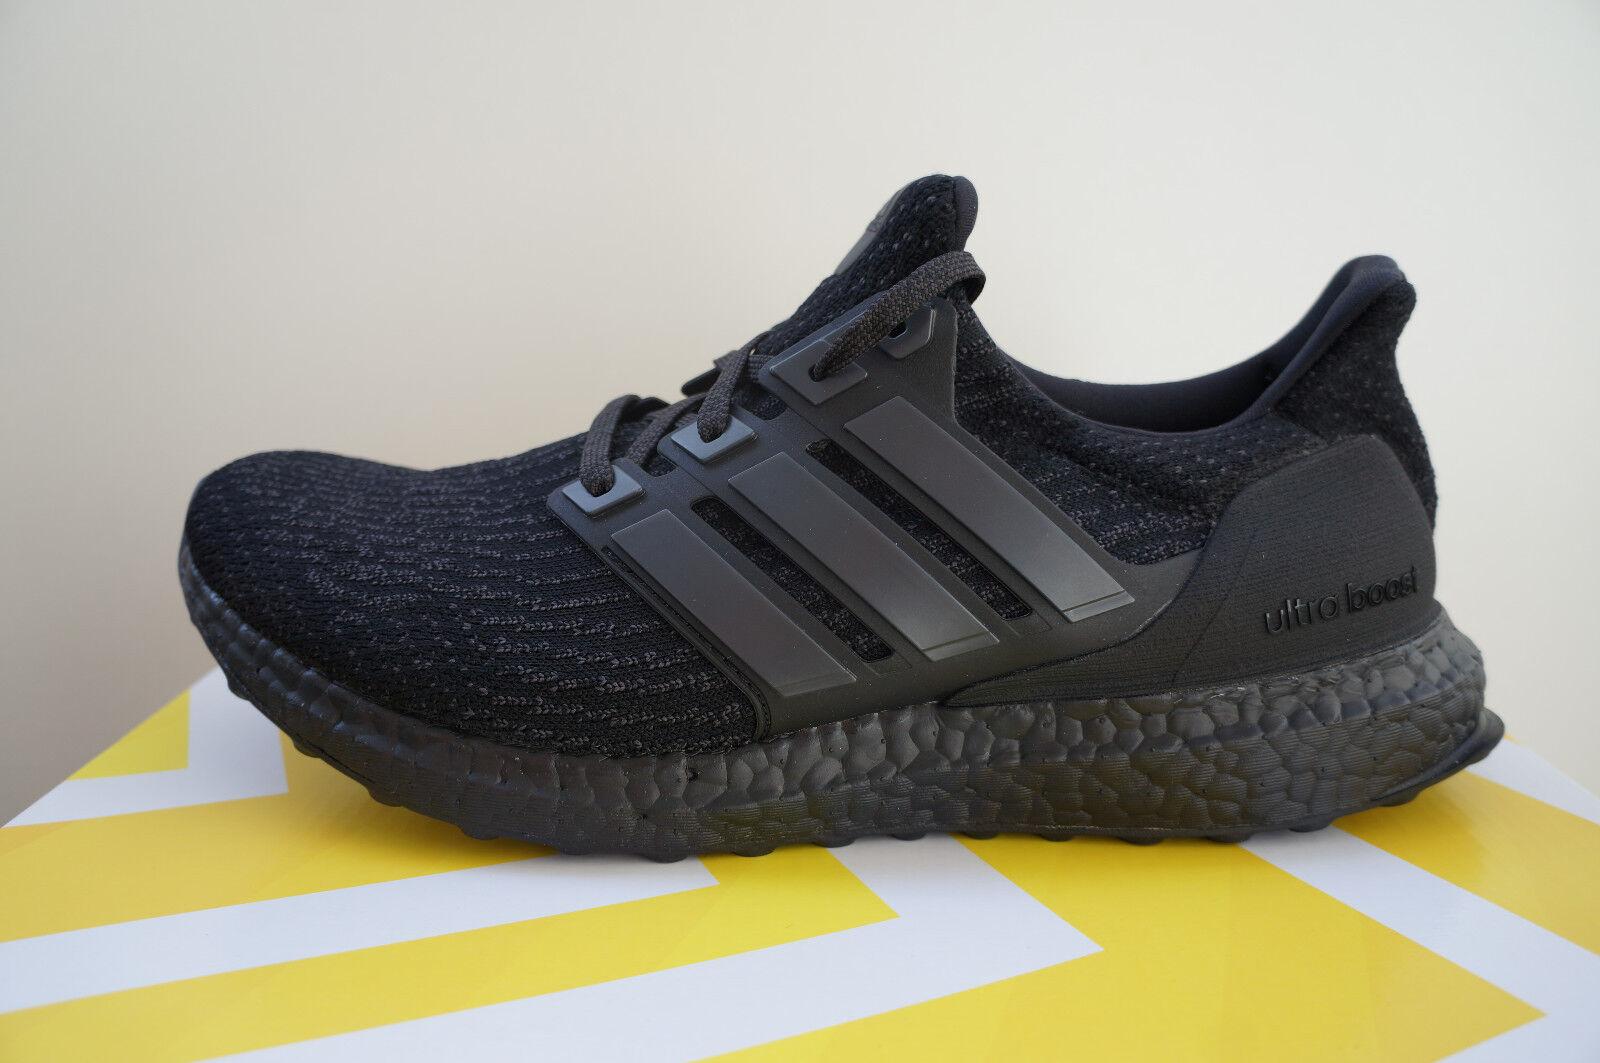 Adidas ultraboost 3.0 triple negro all (40-44) Boost ultra cg3038 negro